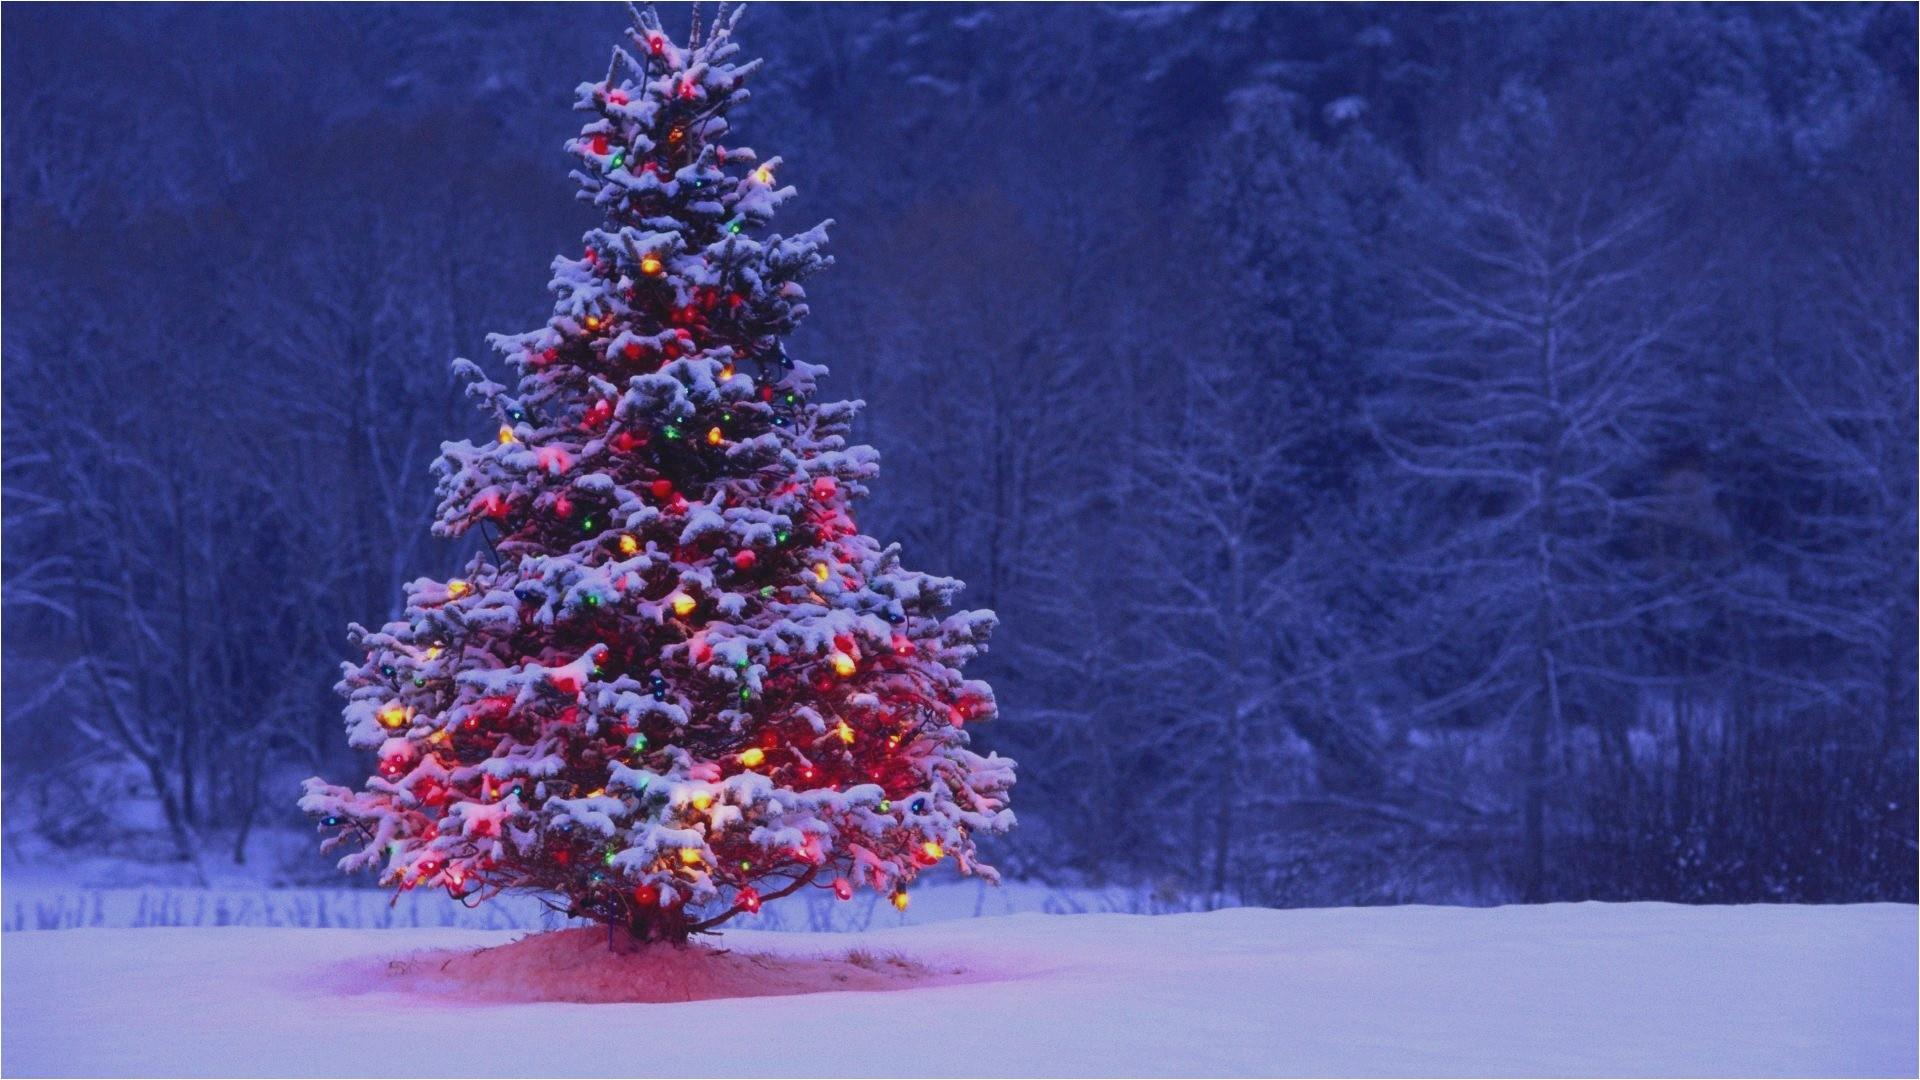 63+] Desktop Backgrounds For Christmas on WallpaperSafari